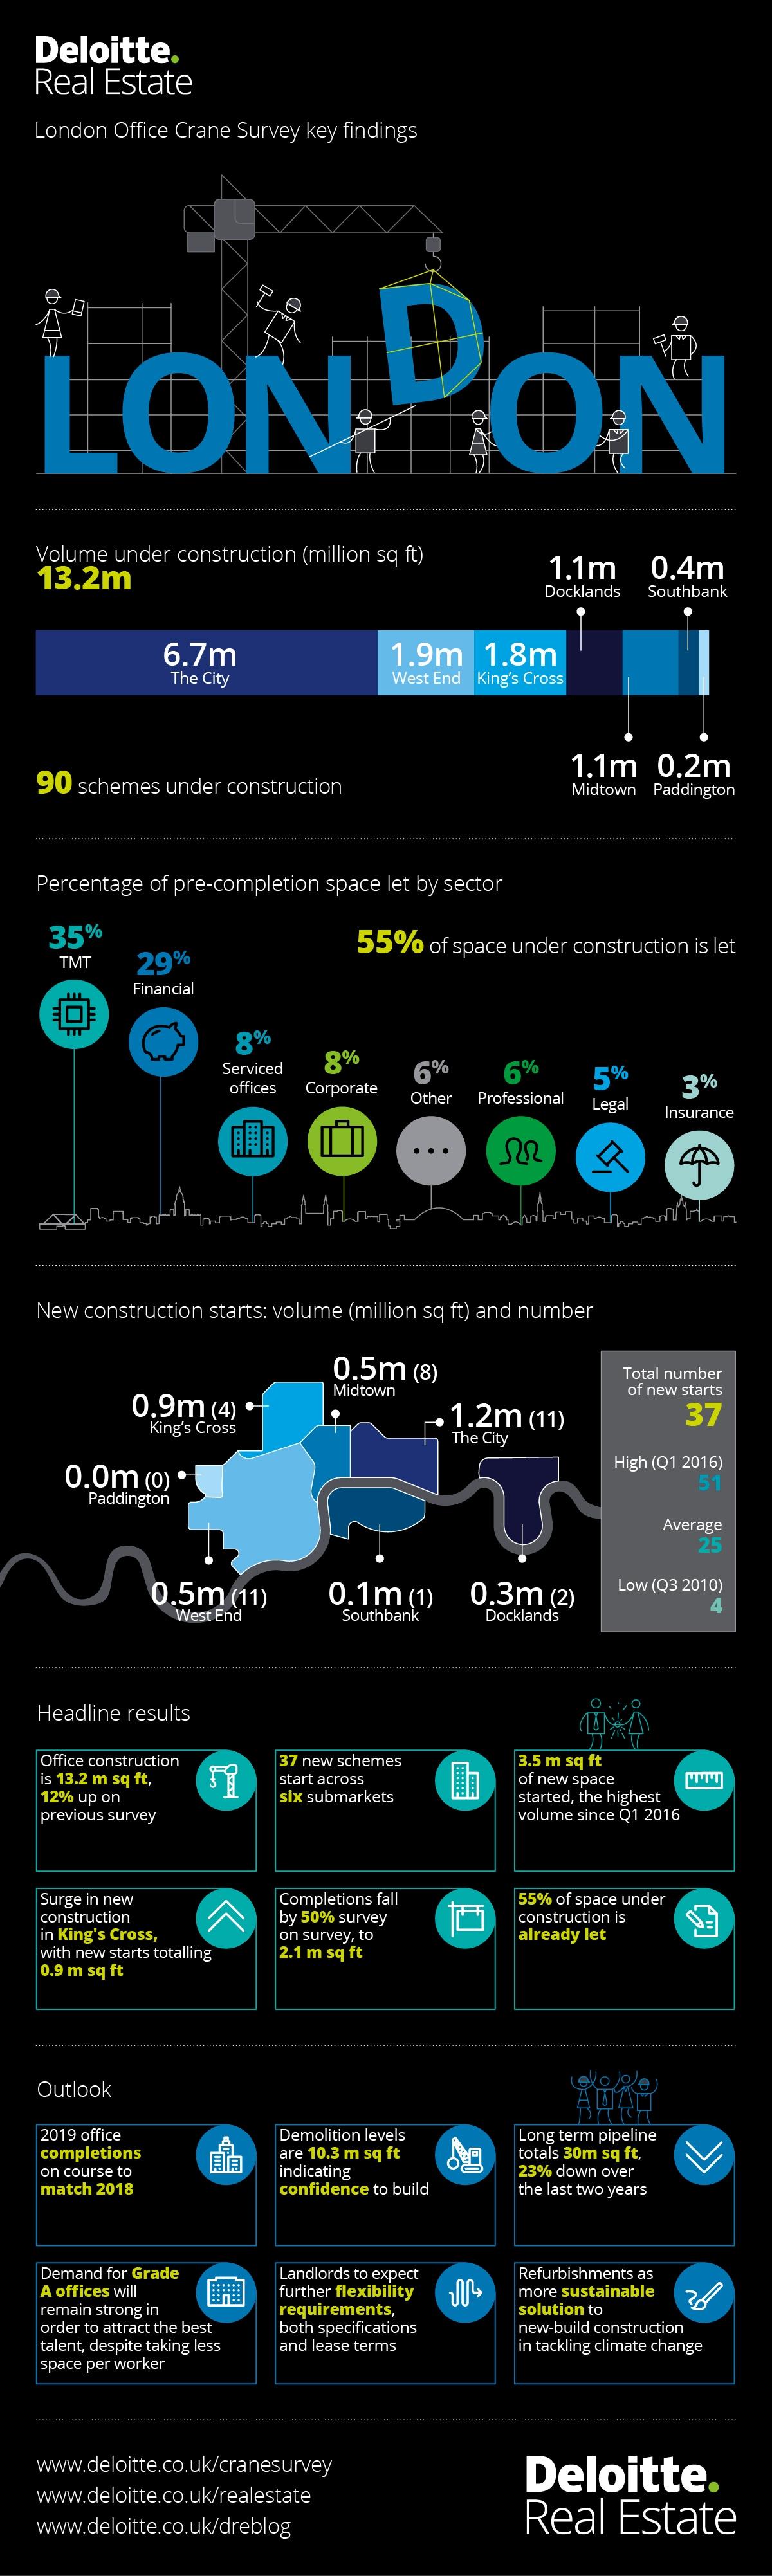 The London Office Crane Survey | Deloitte UK